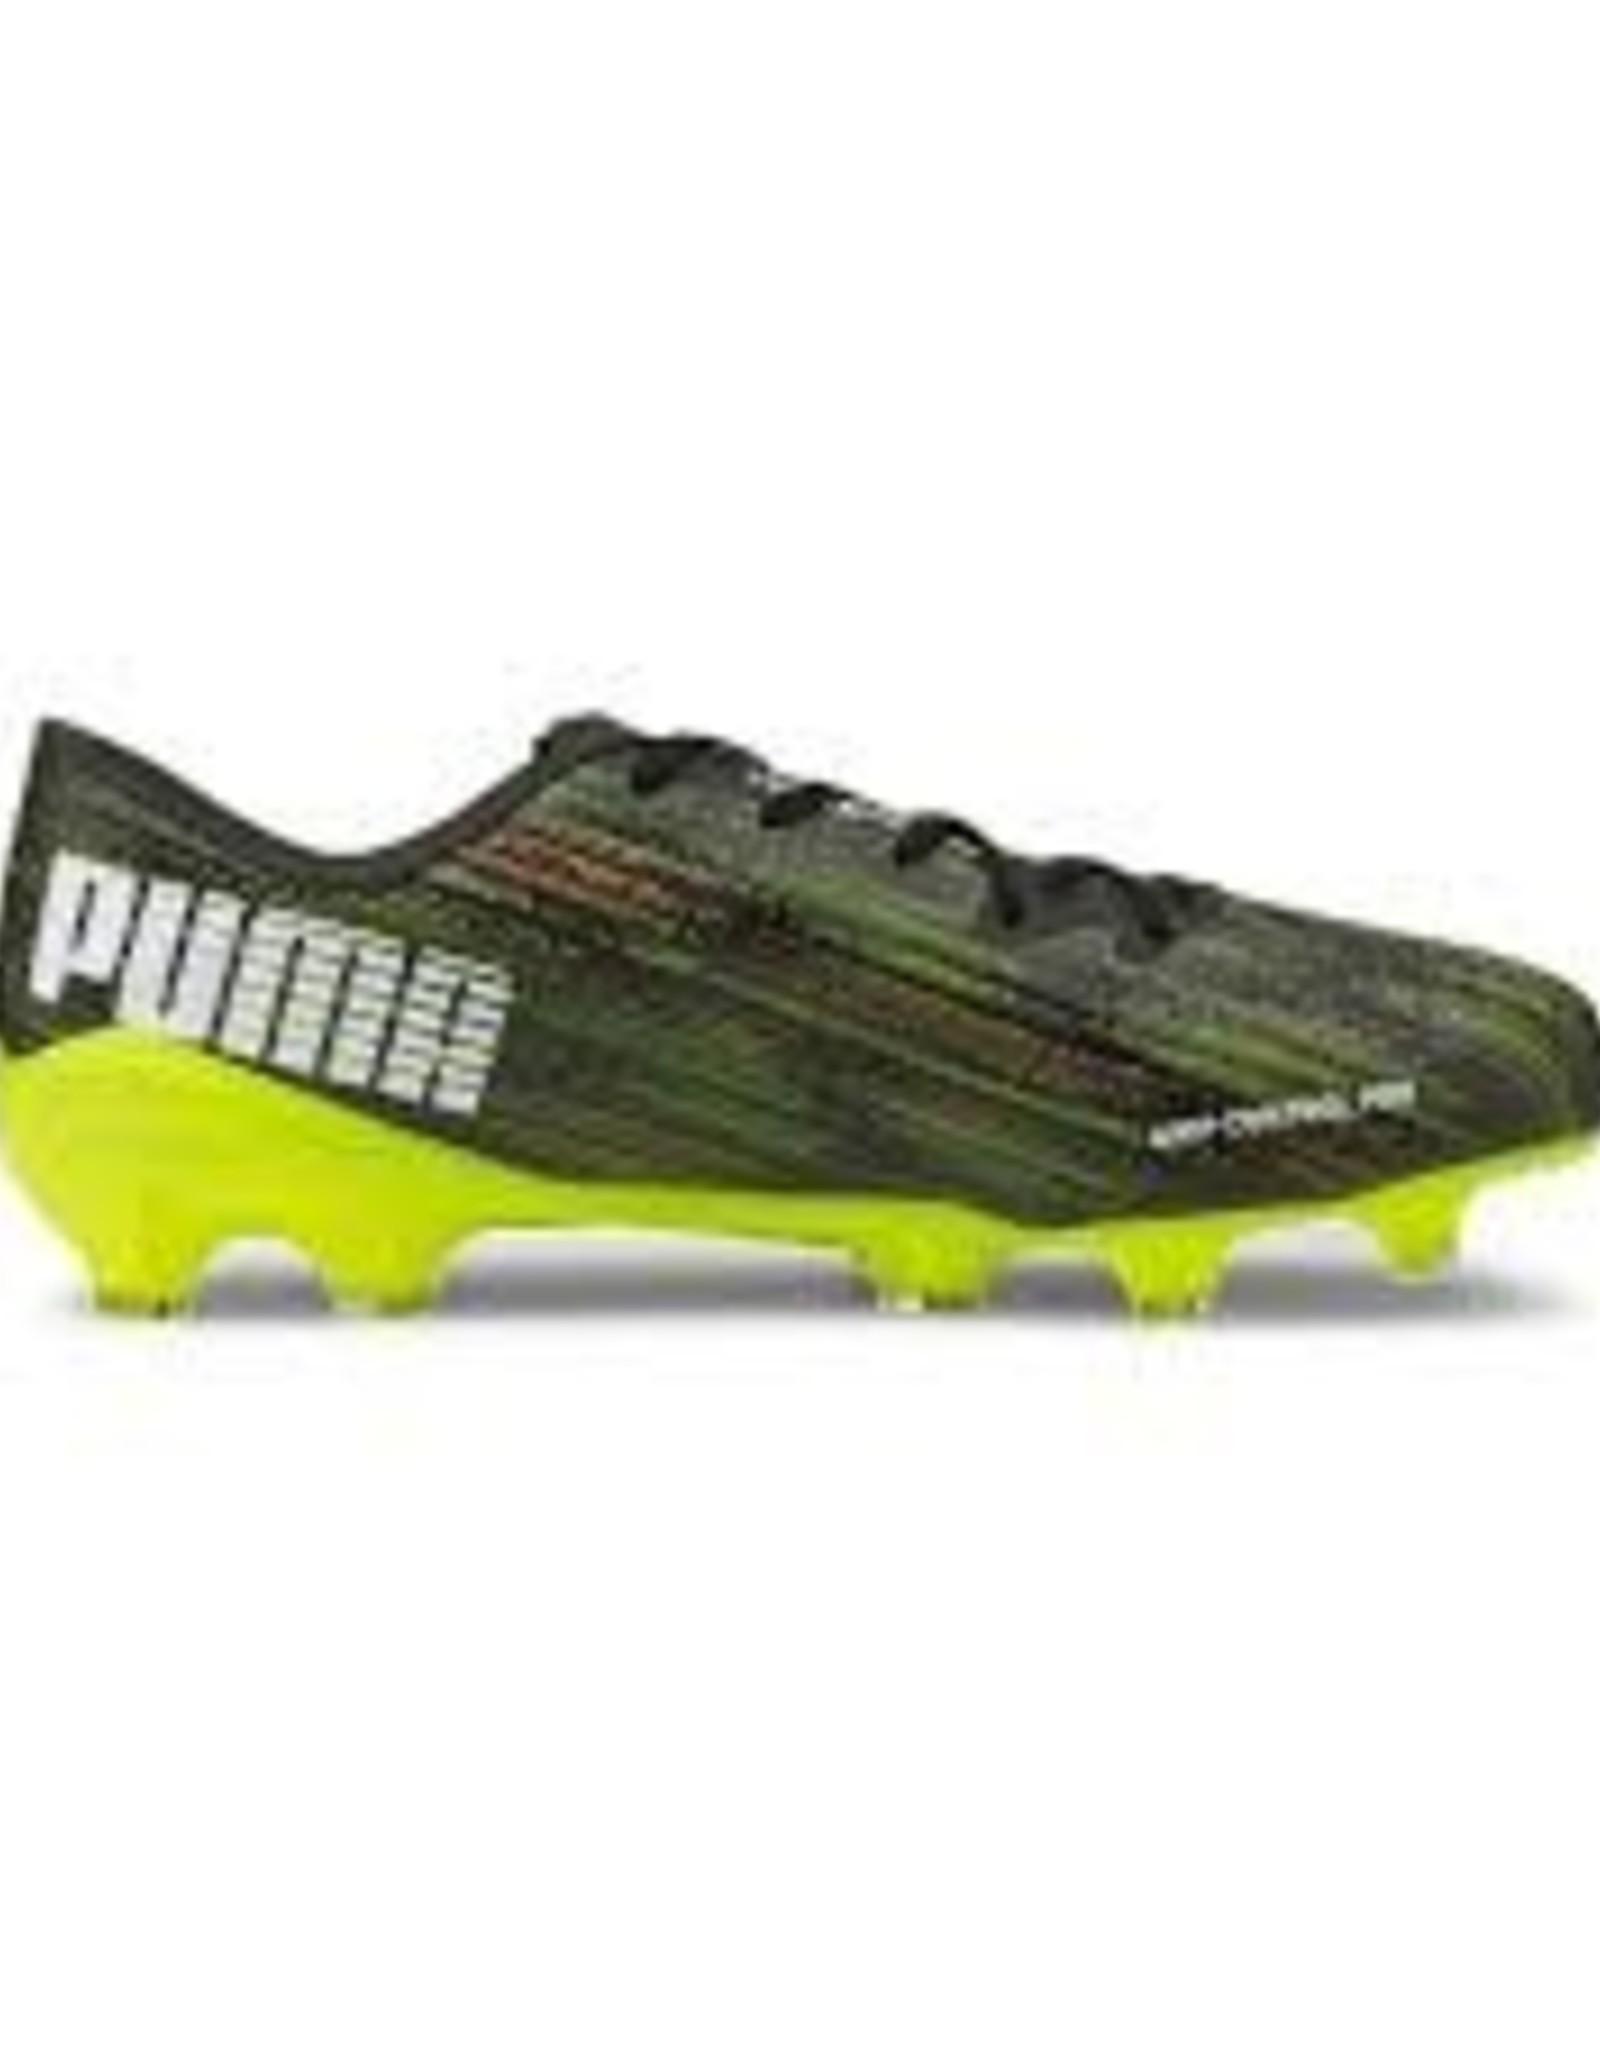 Puma Puma FG Ultra 2.2